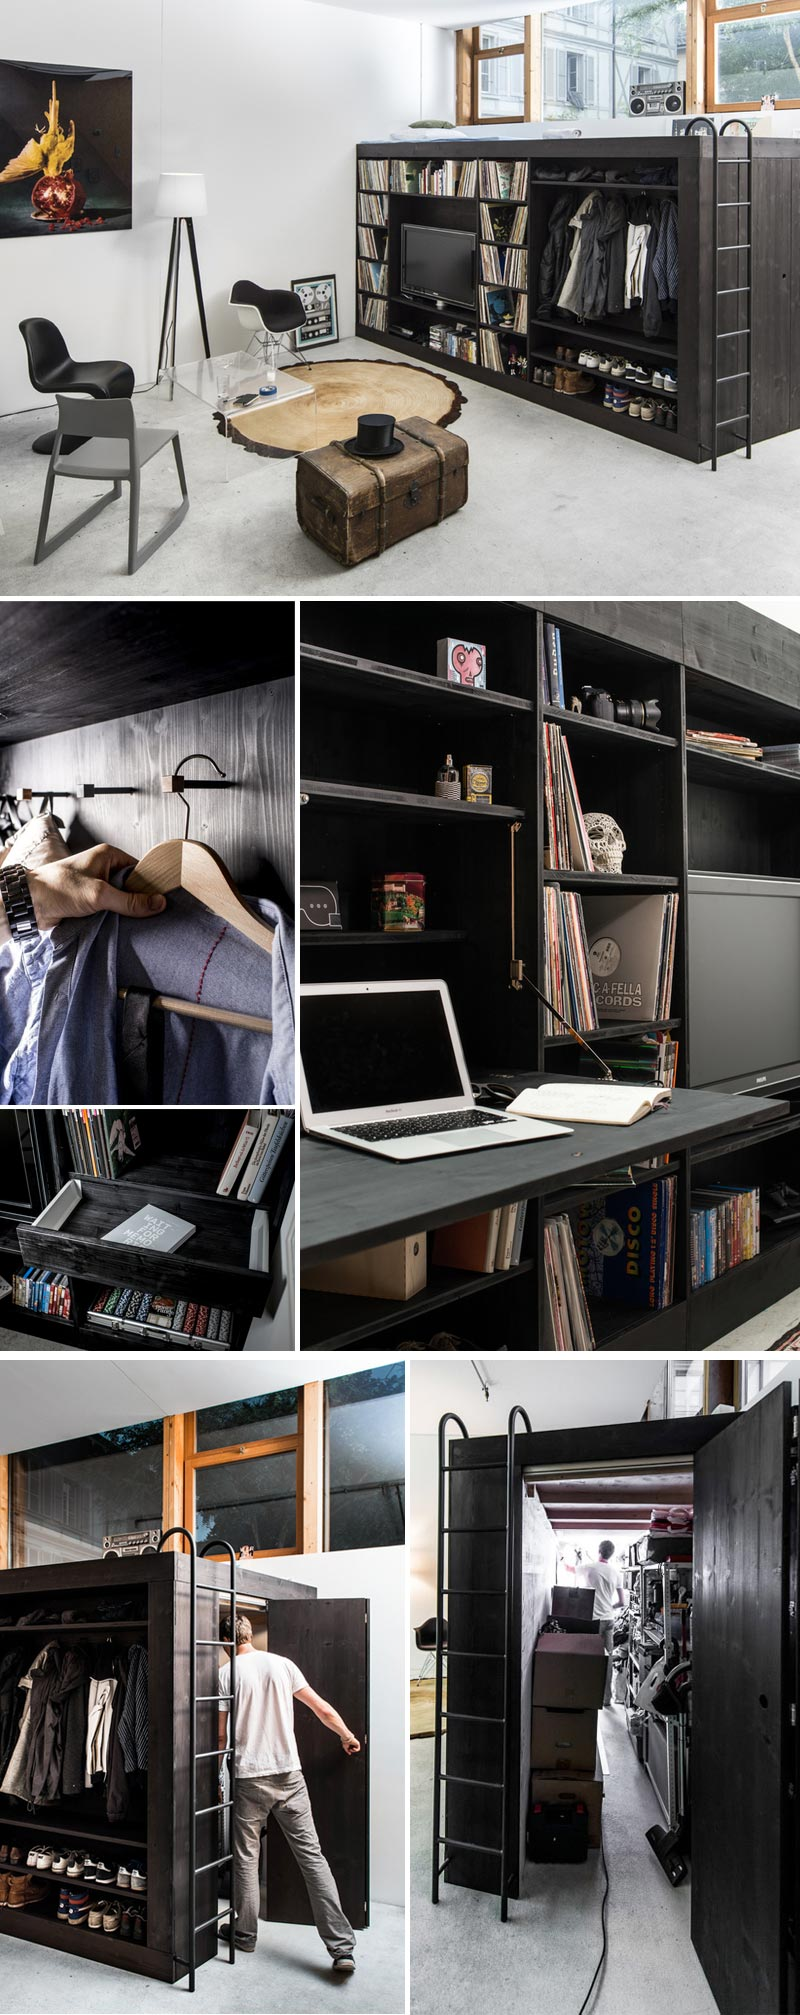 9 Awesome Space Saving Furniture Designs Tico Tina